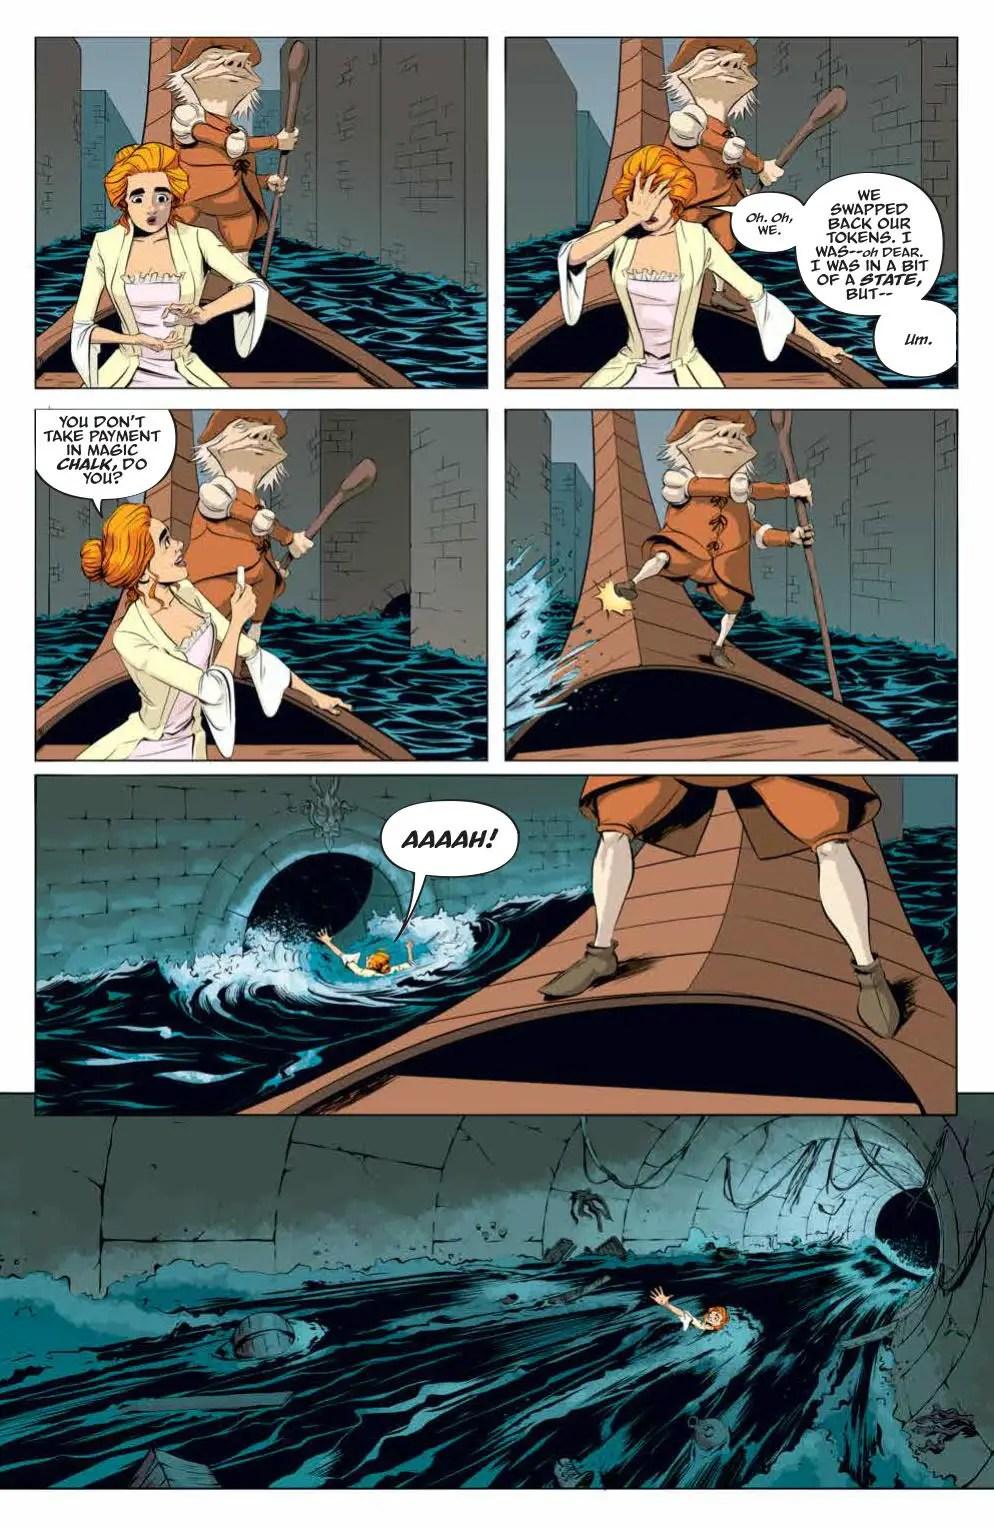 Jim Henson's Labyrinth: Coronation #6 Review